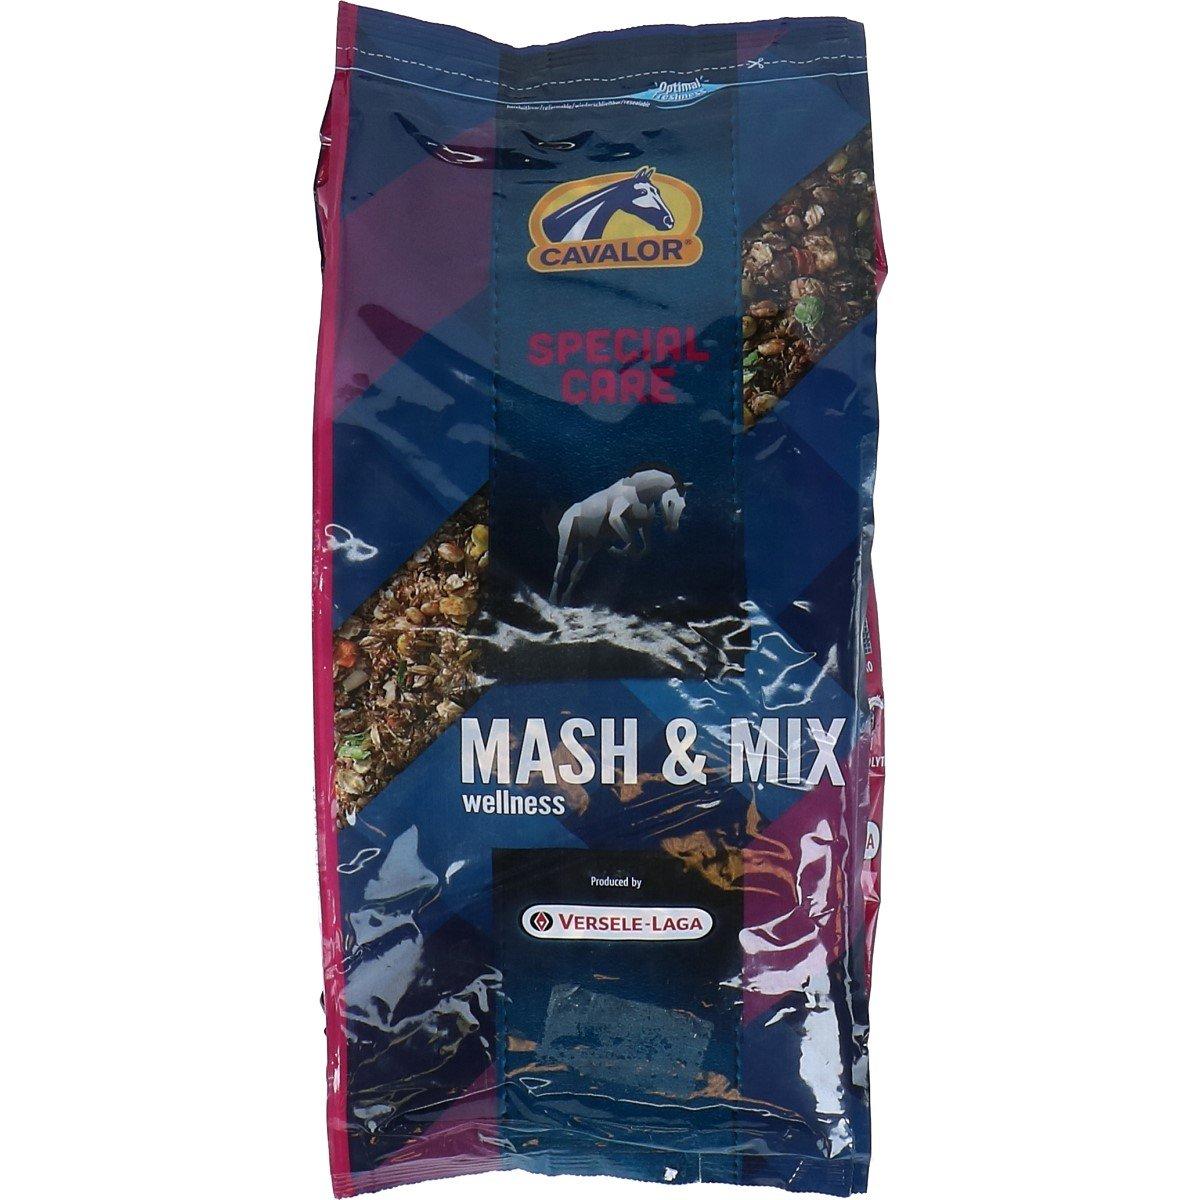 Afbeelding van Cavalor Mash & Mix 1,5kg